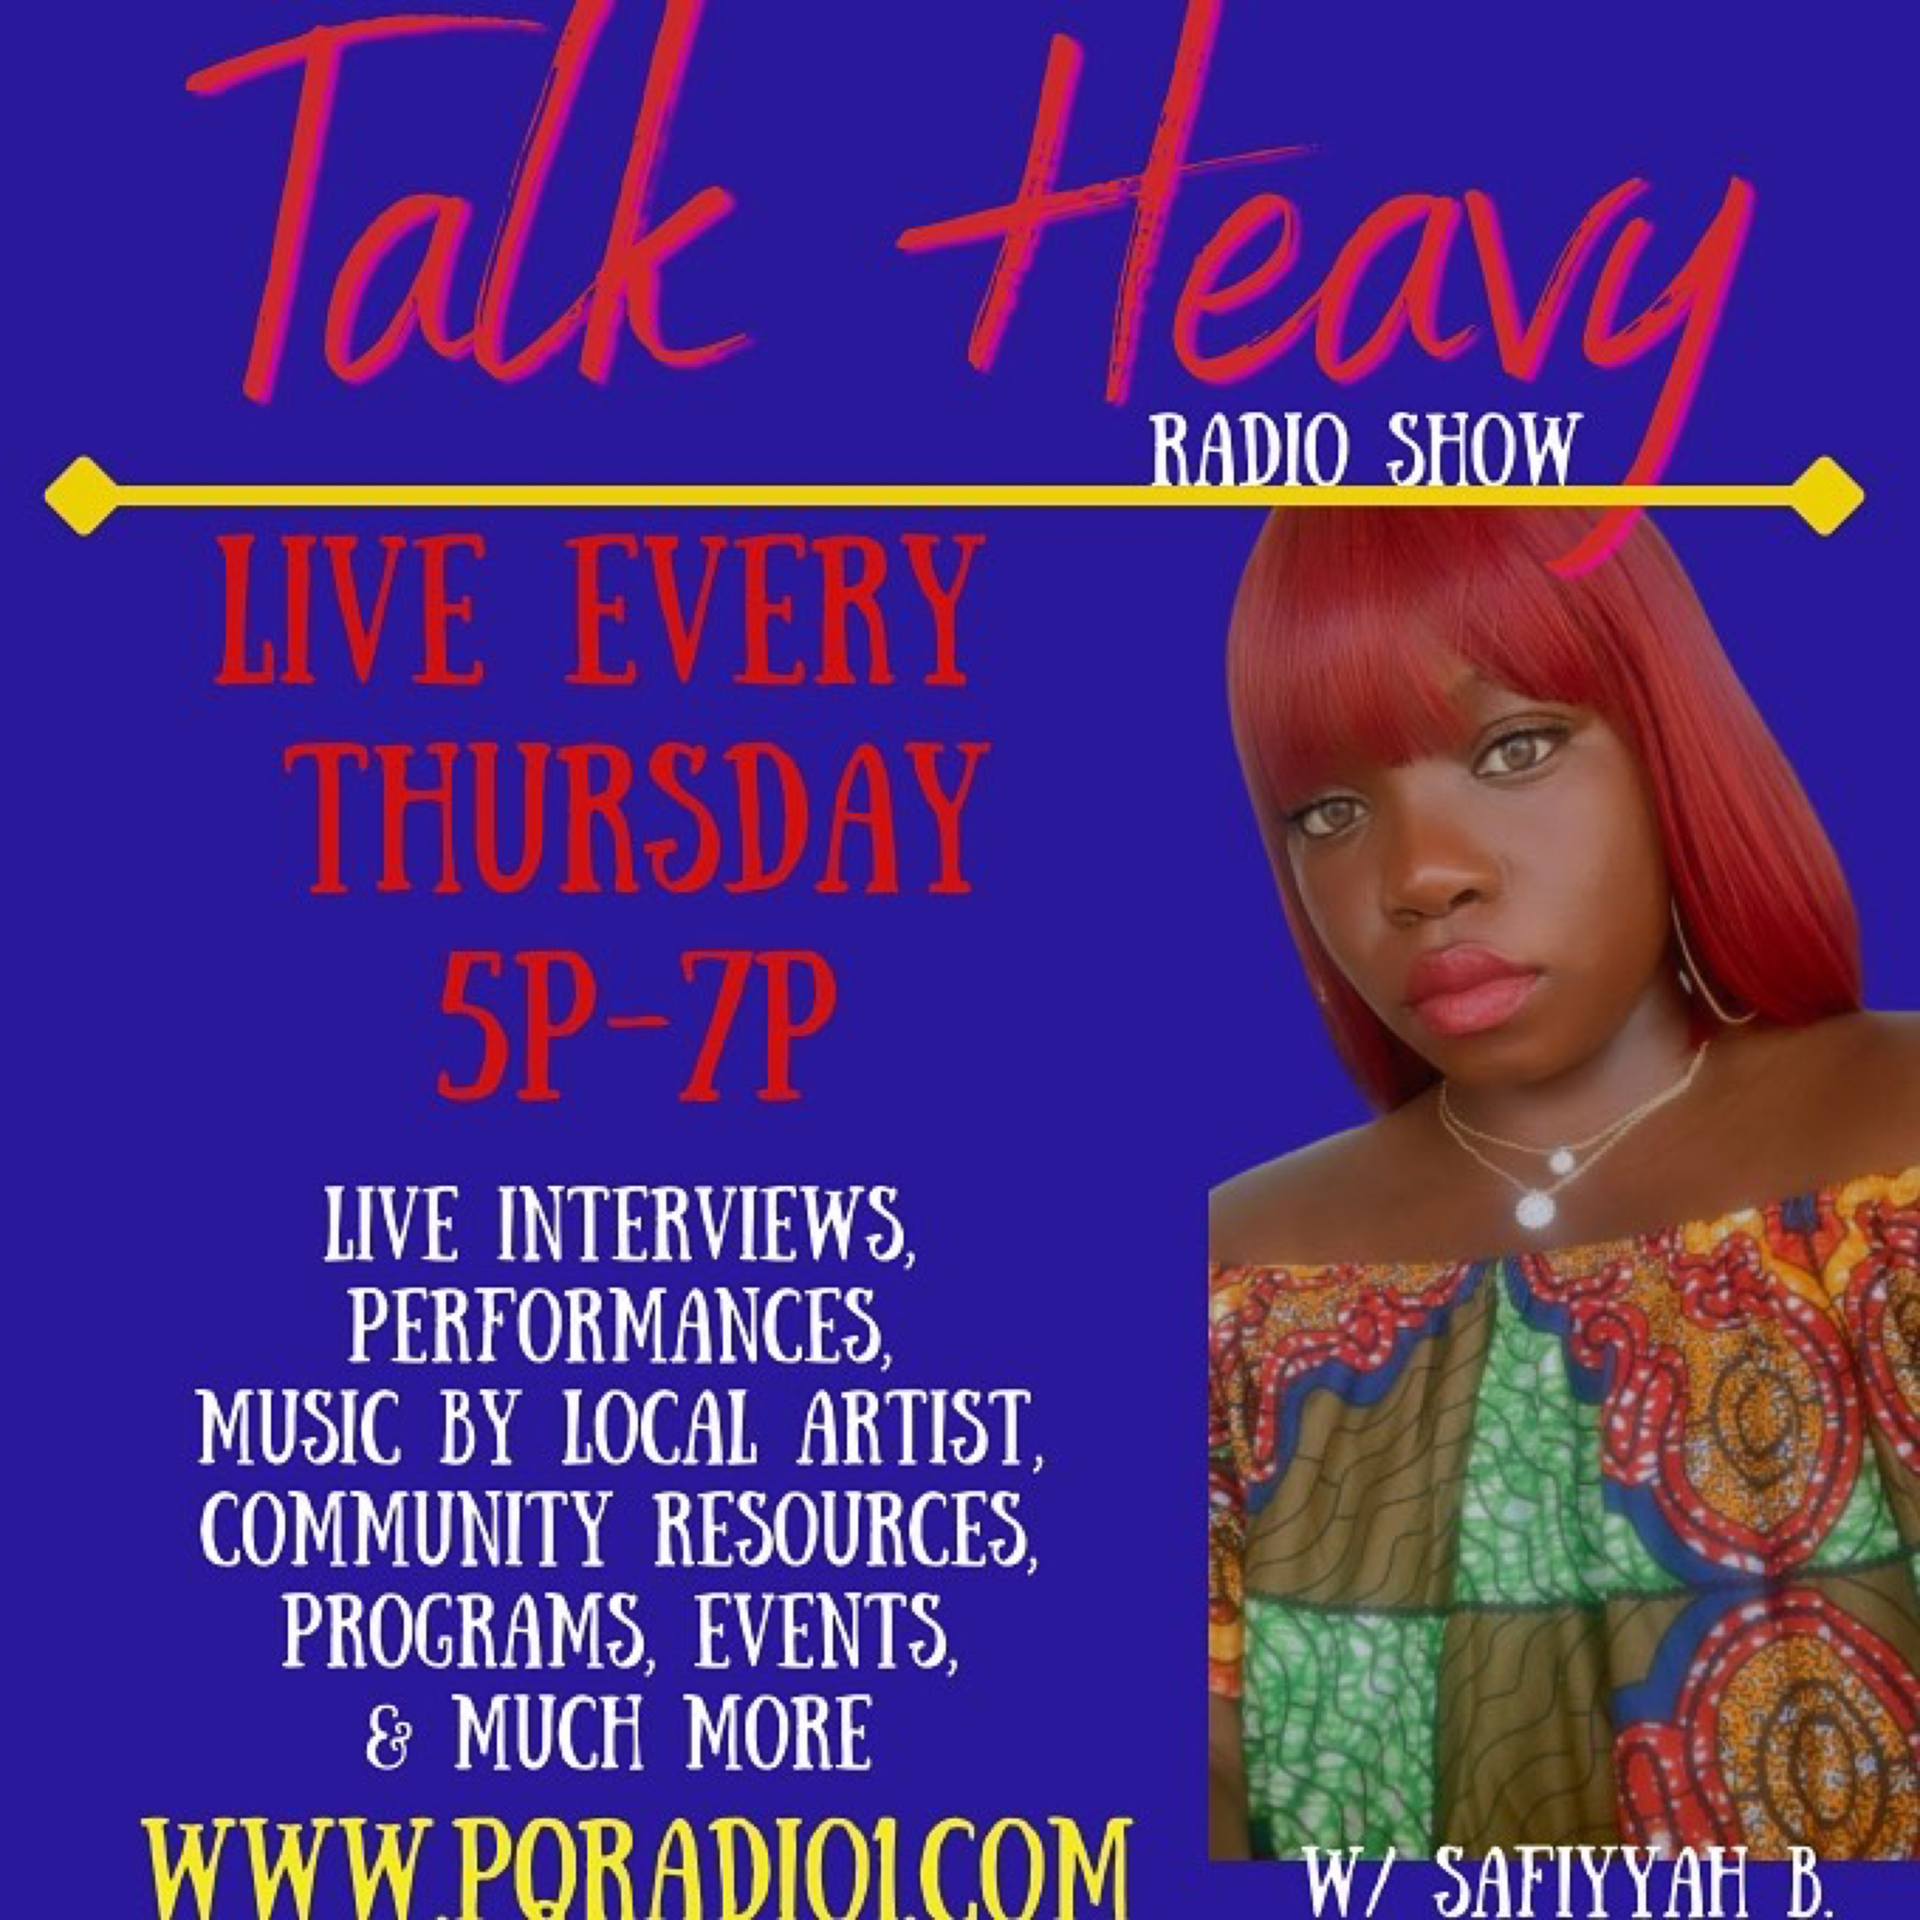 The Talk Heavy Show – Thursdays at 5pm